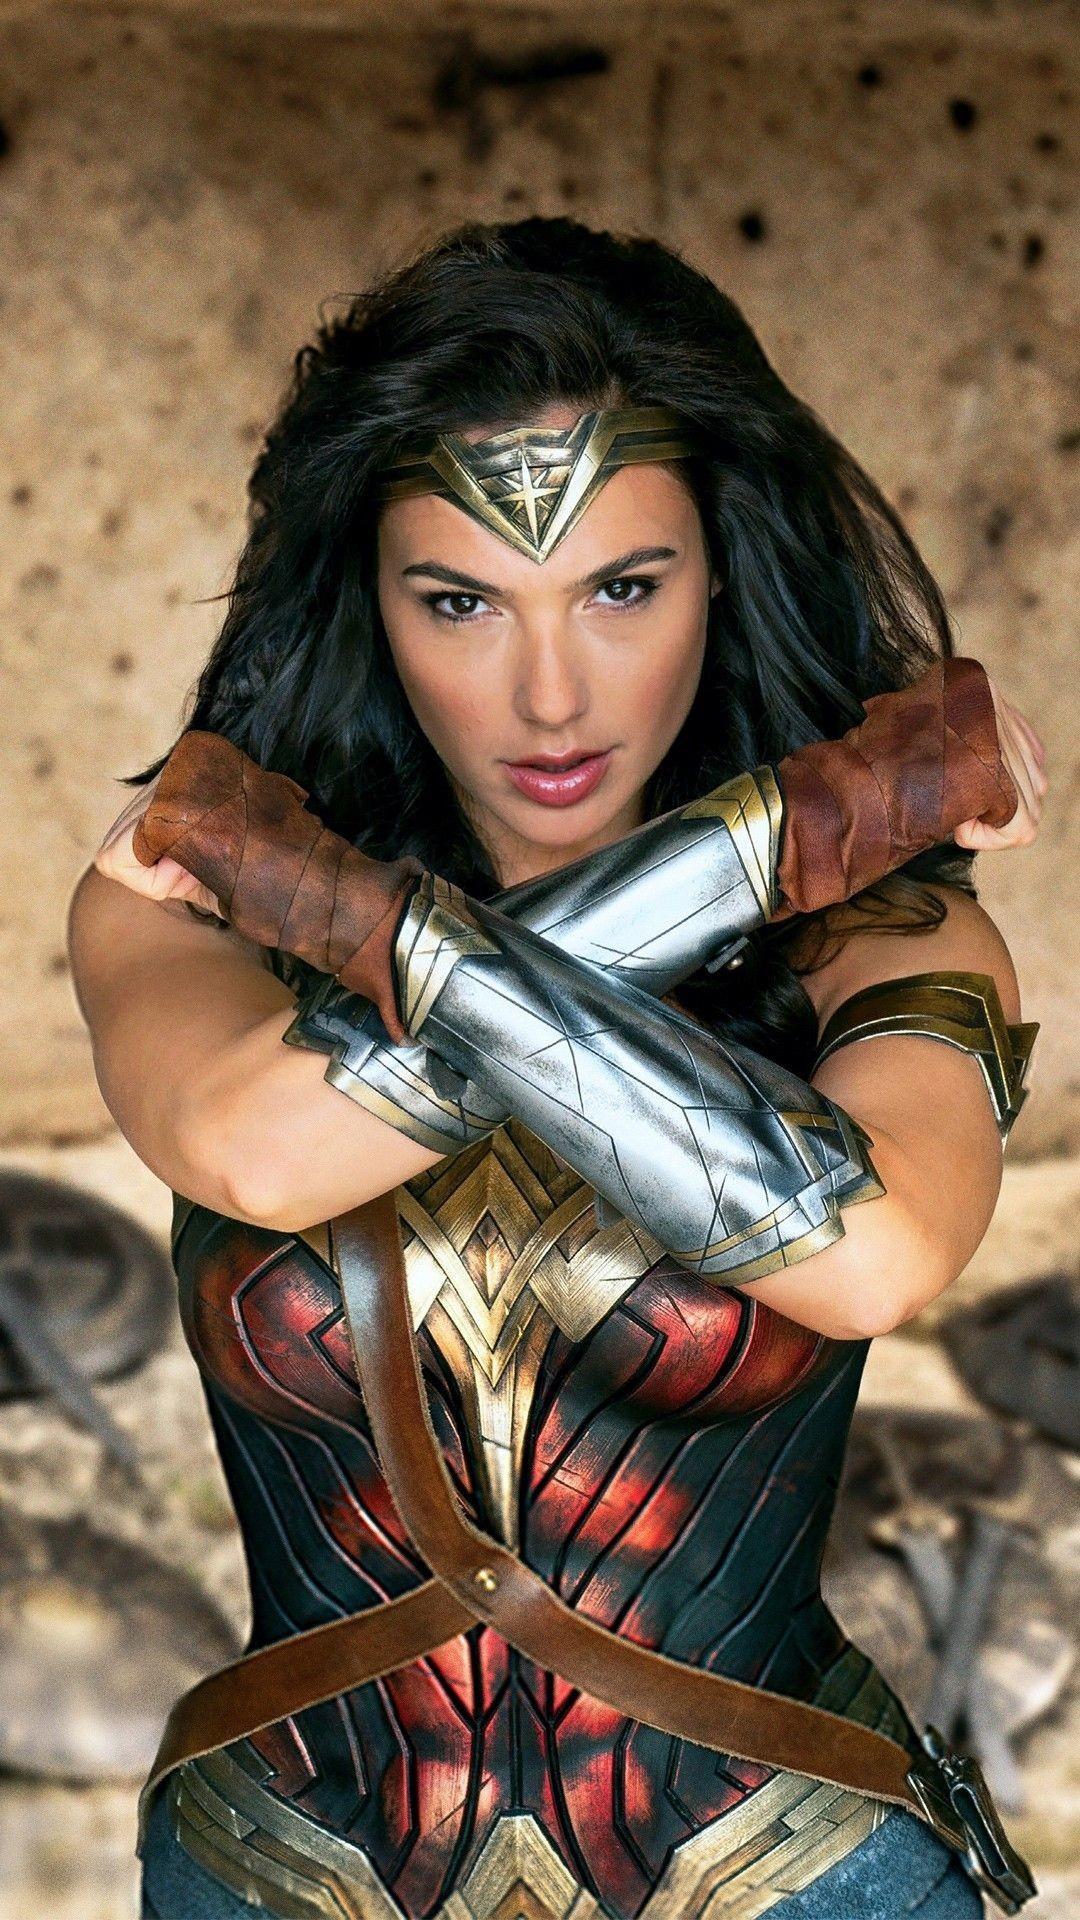 Res: 1080x1920, iPhone X Wallpaper Wonder Woman - Best iPhone Wallpaper